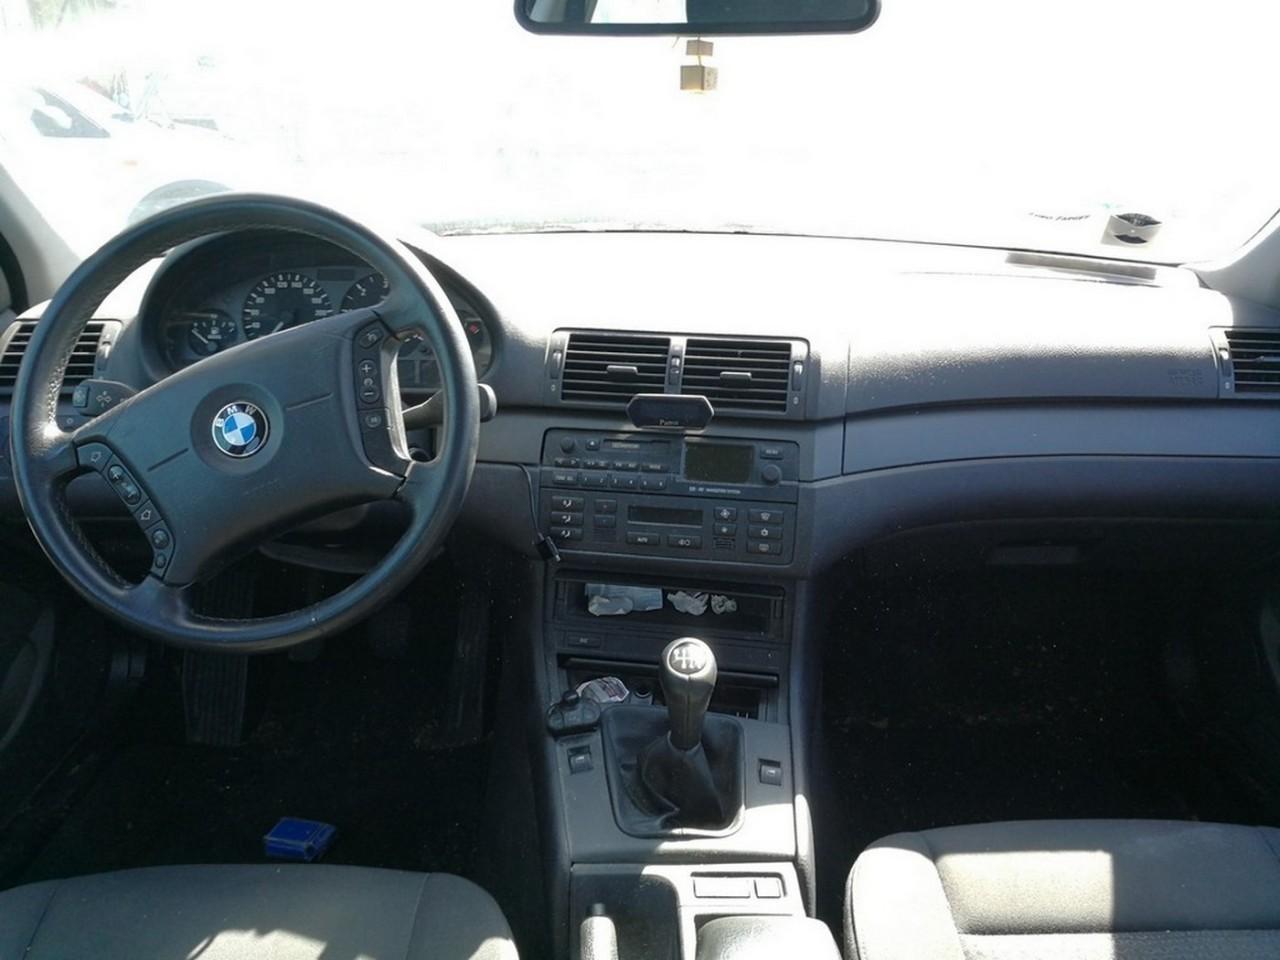 DEZMEMBRARI AUTO BMW 320d E46 an 2001 - 2002 - 2003 - 2004 - 2005